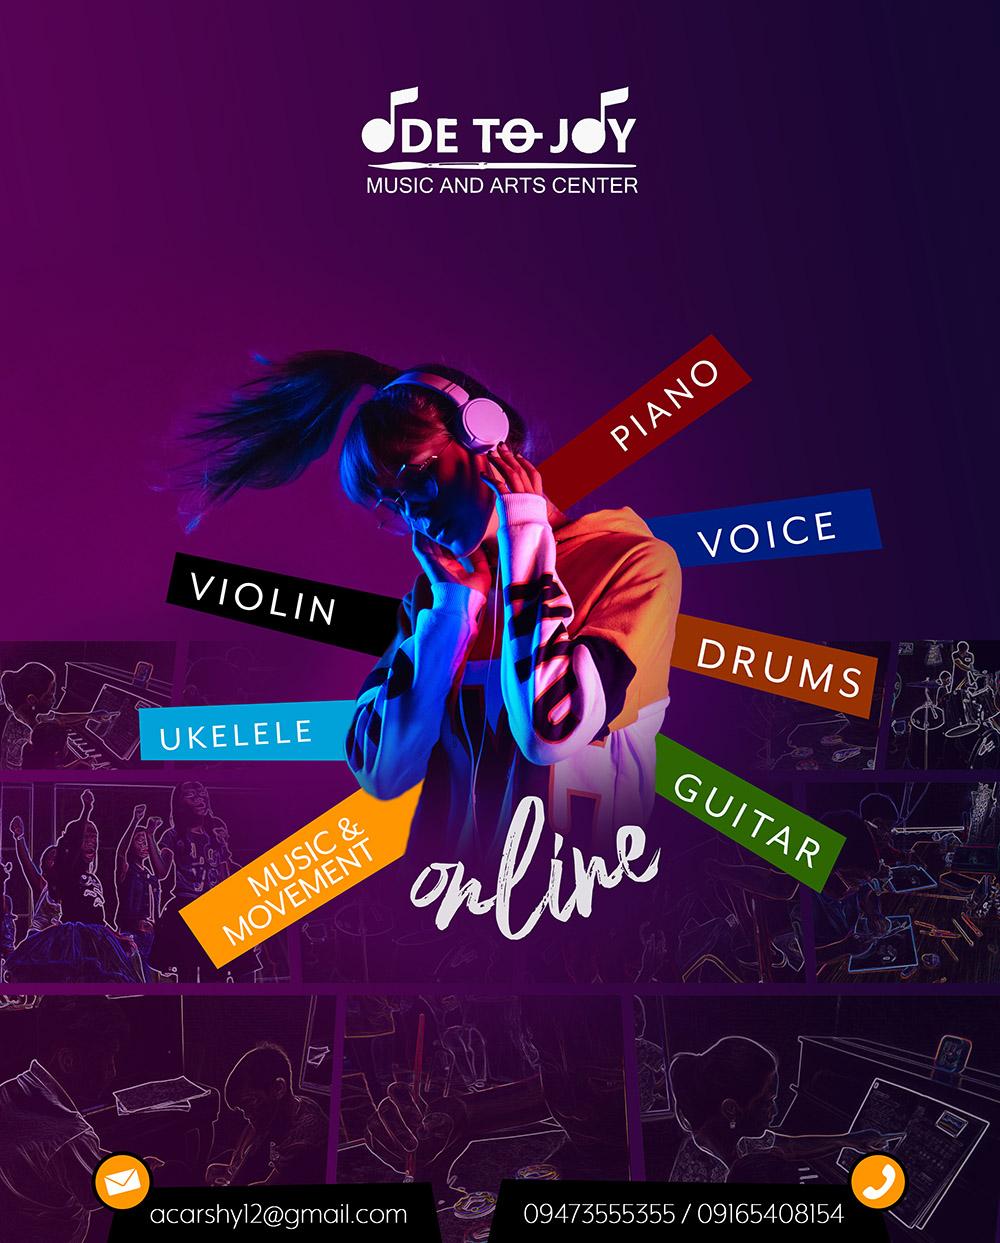 Poster: Ode to joy